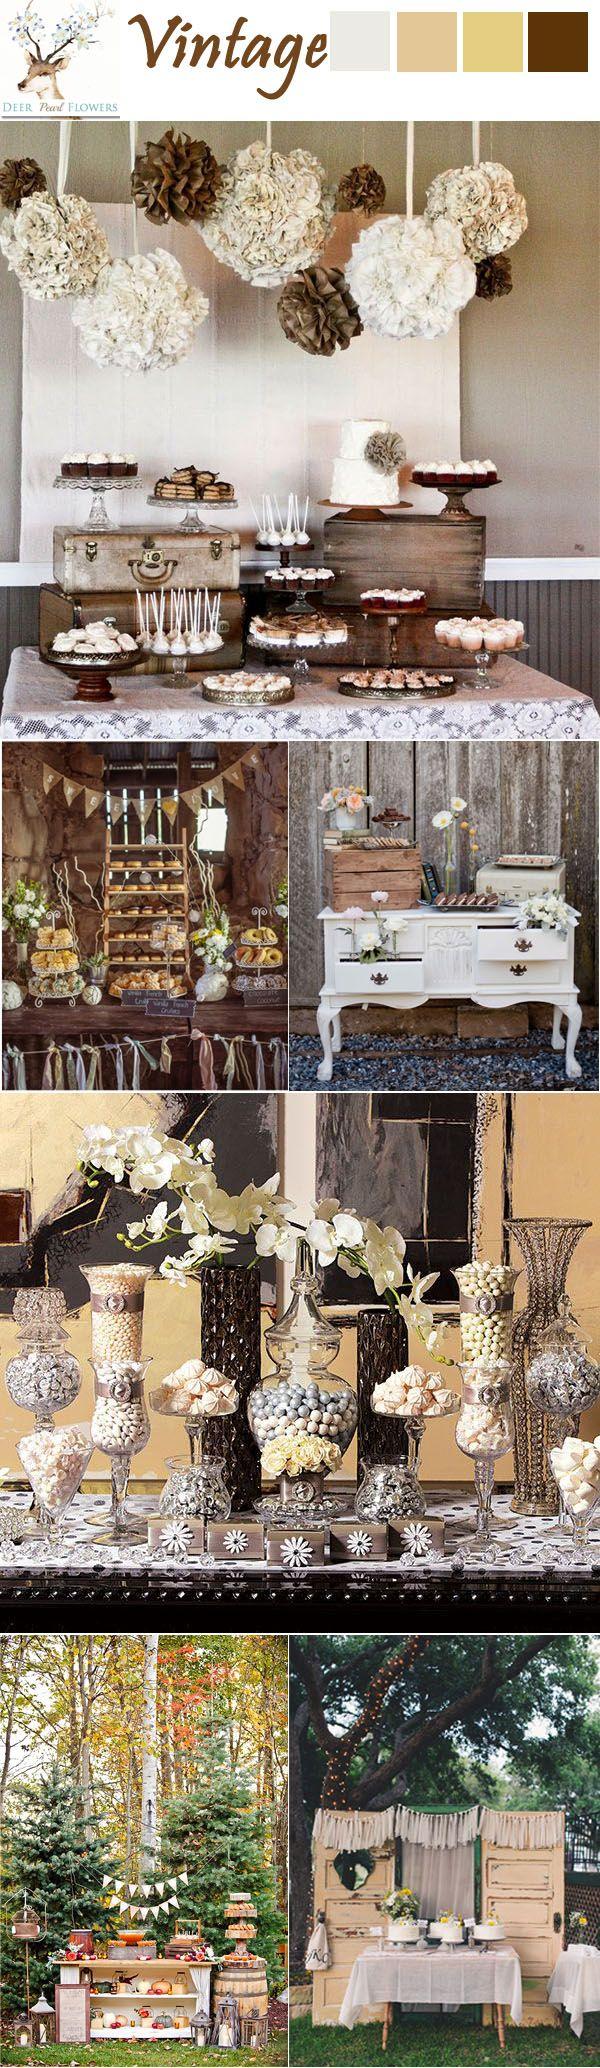 38 Adorable Wedding Dessert Table Ideas | http://www.deerpearlflowers.com/38-adorable-wedding-dessert-table-ideas/: